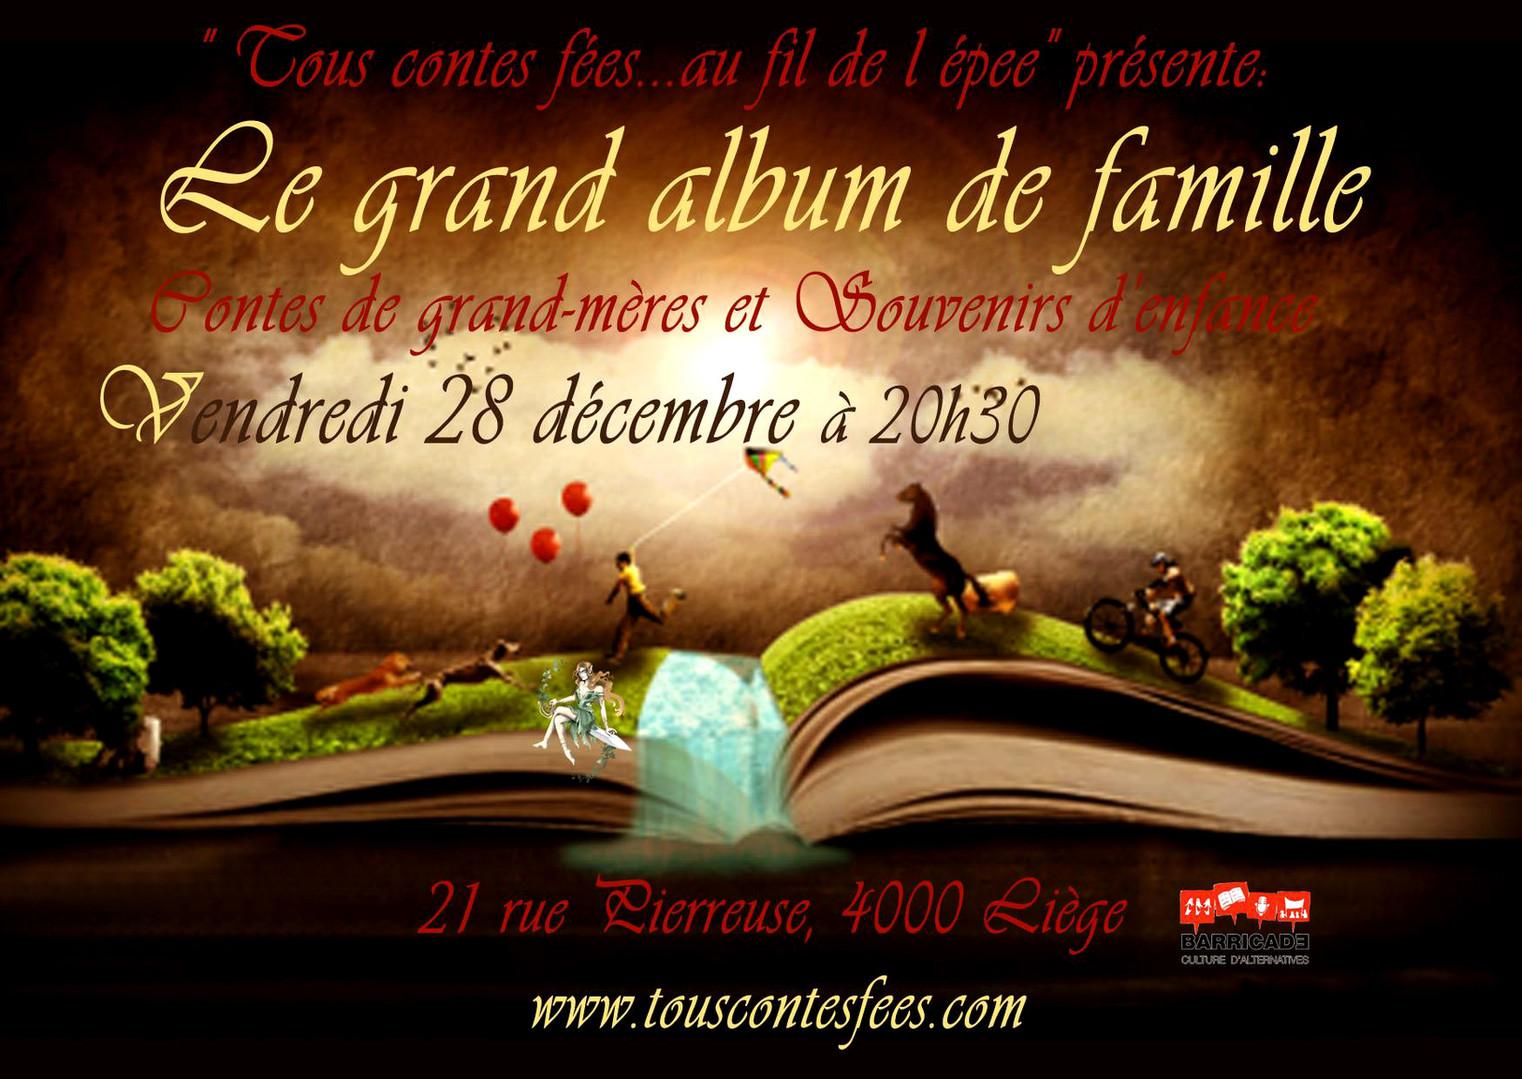 Le grand album de famille